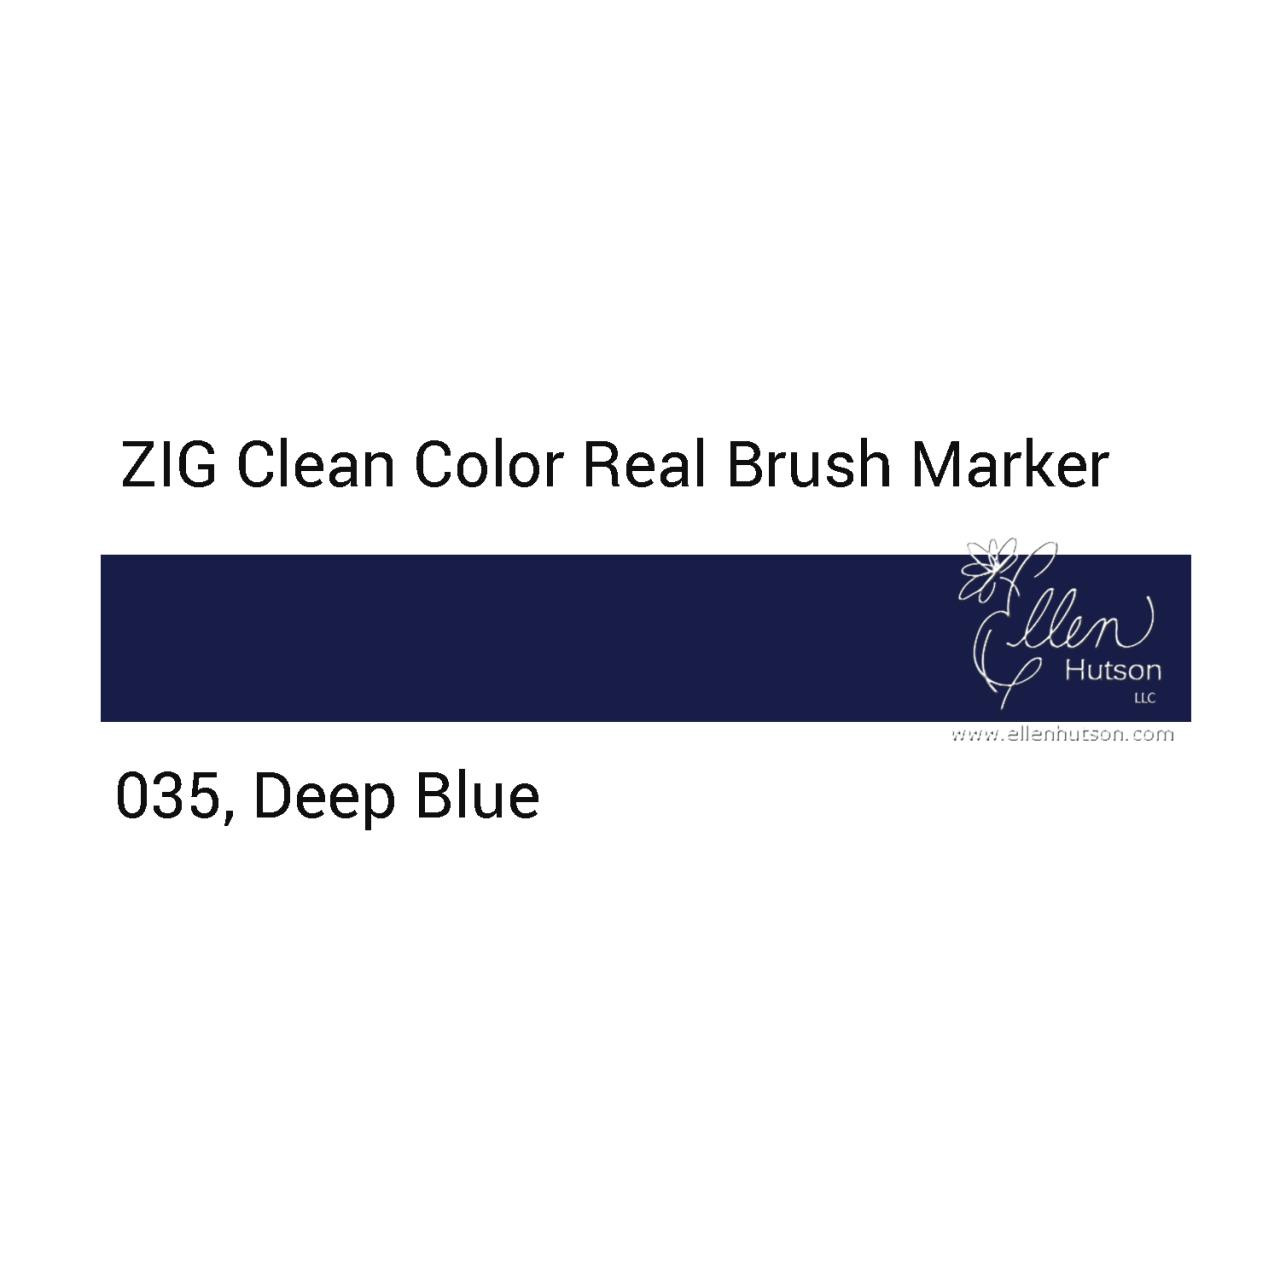 035 - Deep Blue, ZIG Clean Color Real Brush Marker -